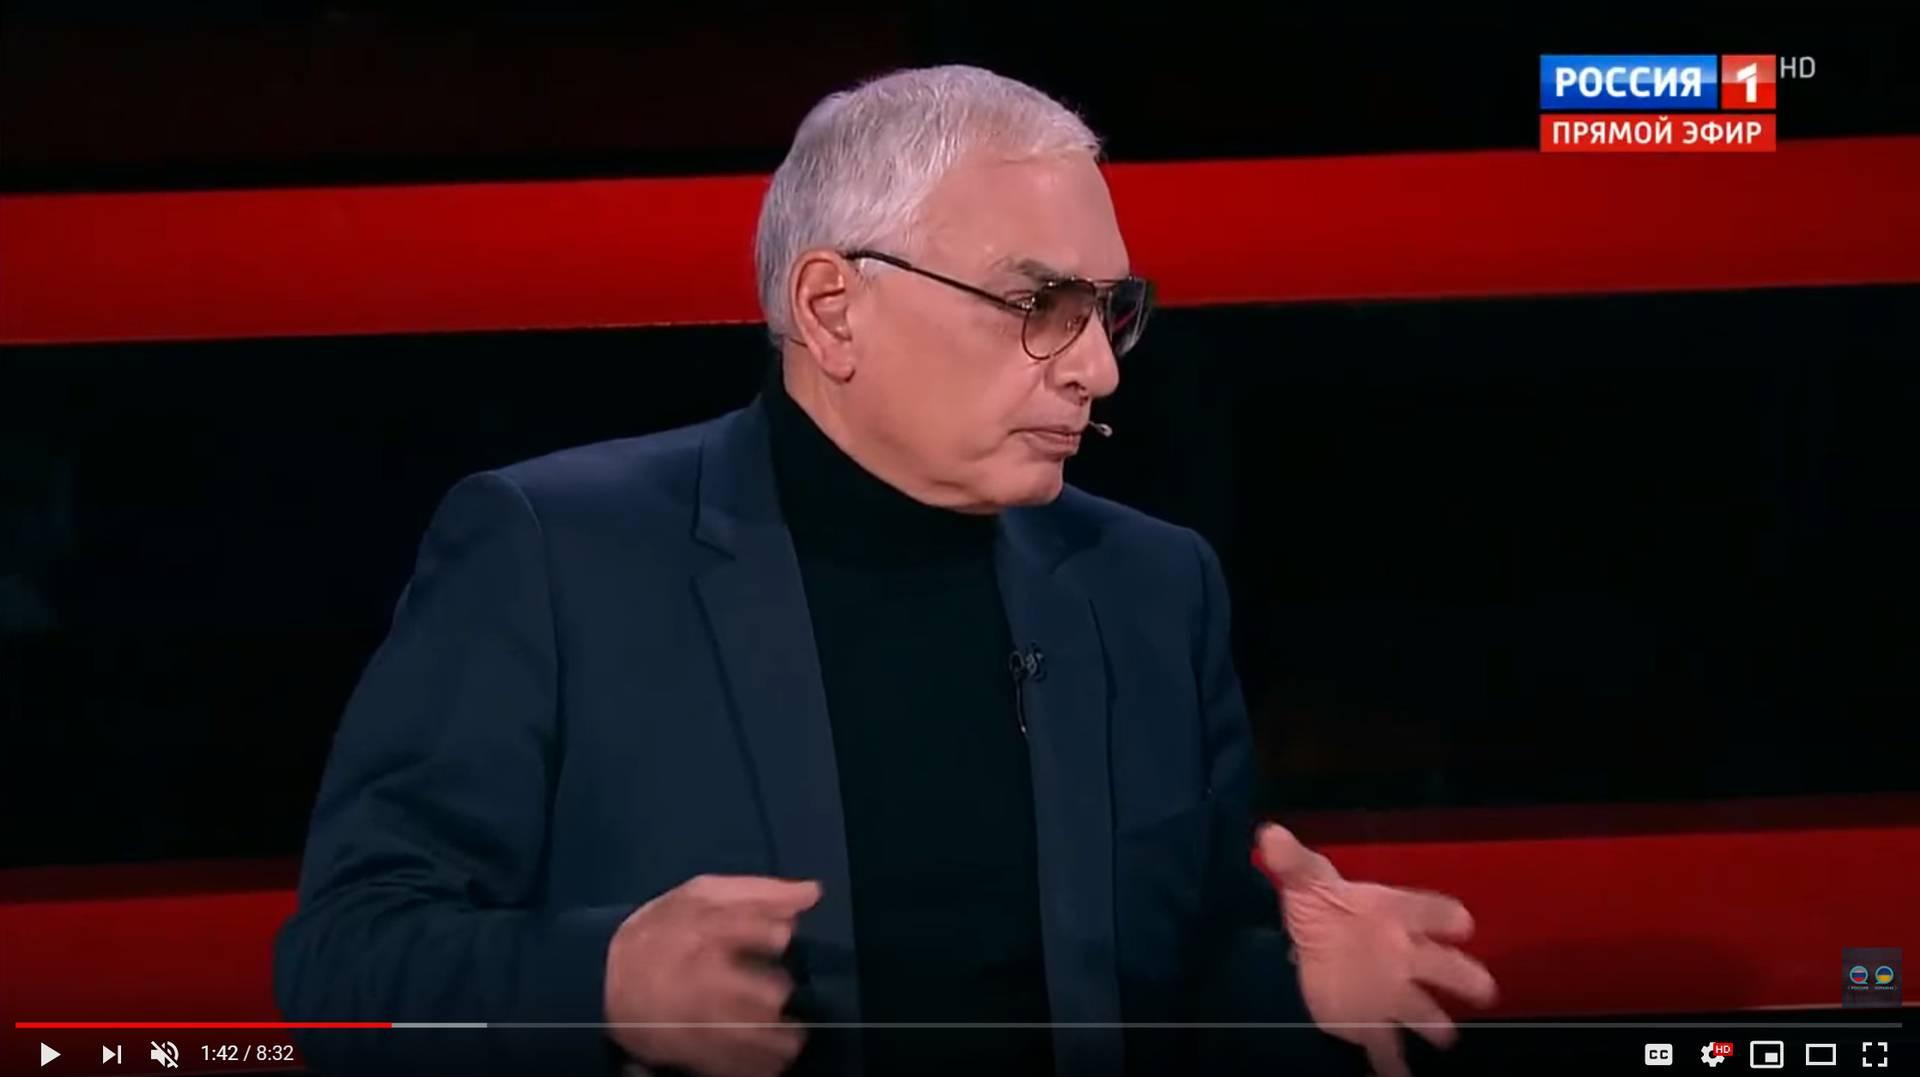 Карен Шахназаров. Цитата из видео https://www.youtube.com/watch?v=OIyrDBrpb60